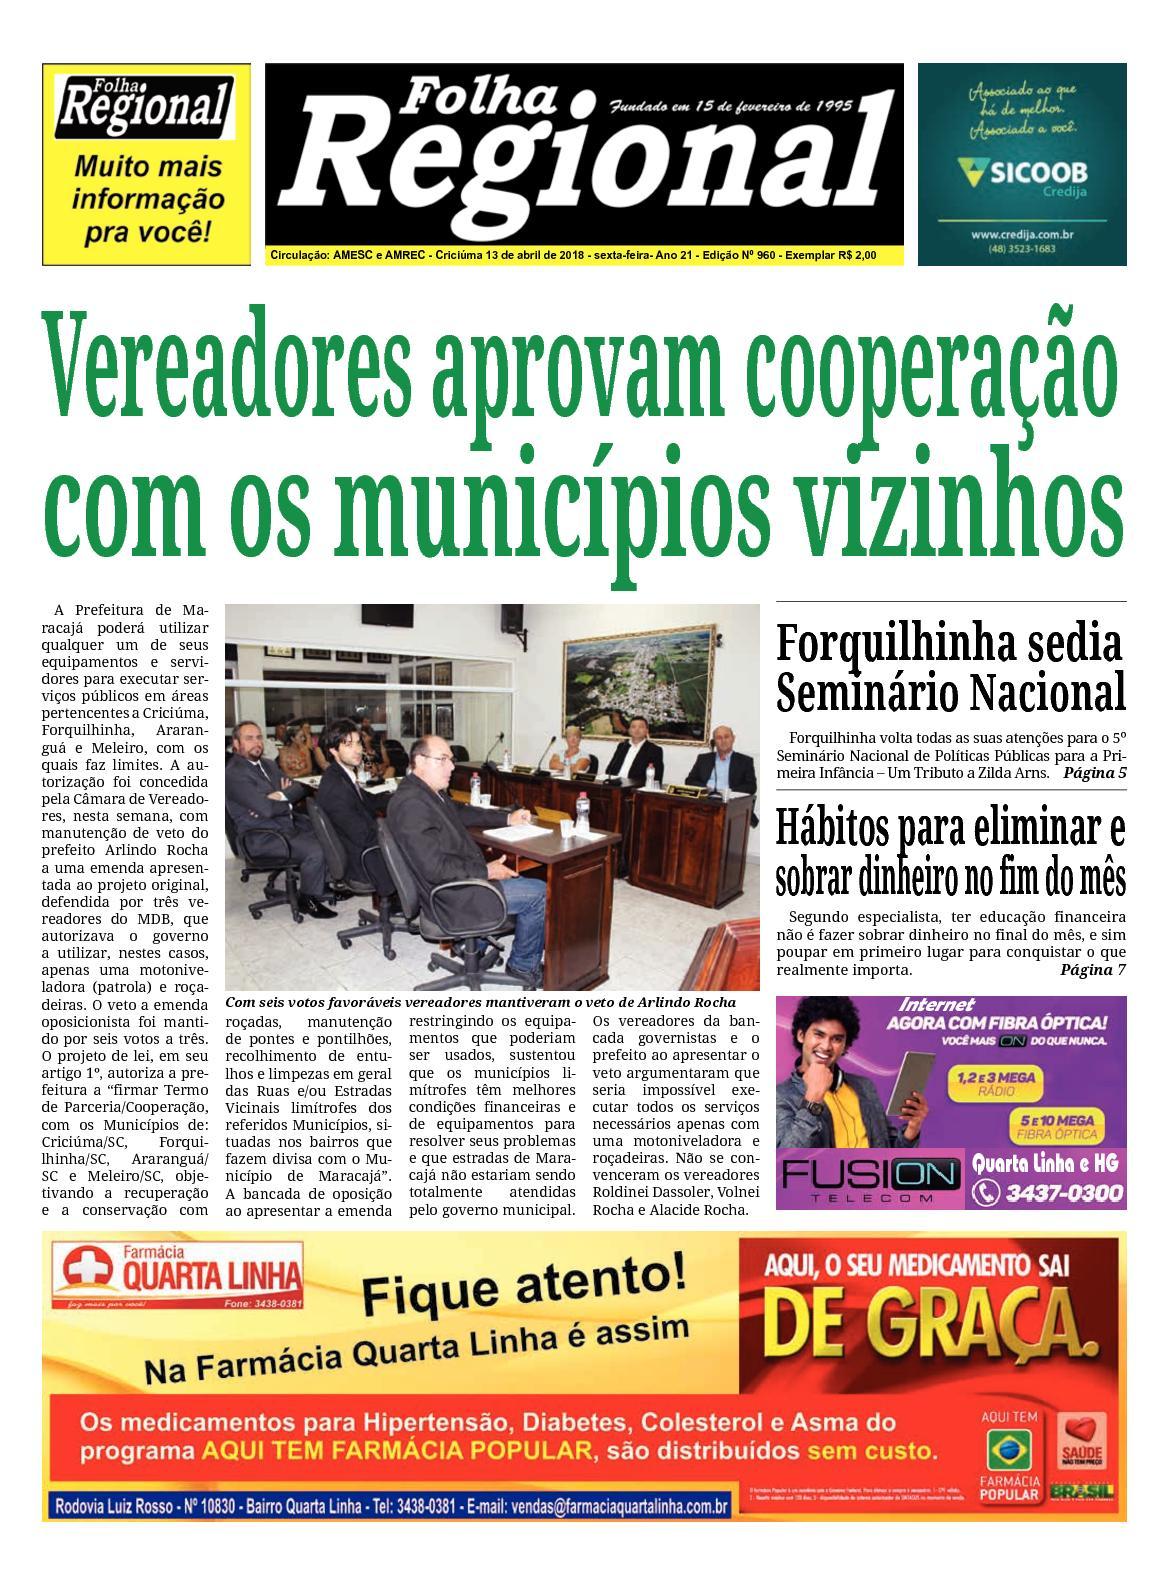 Folha Regional Ed.960 - 13/04/2018